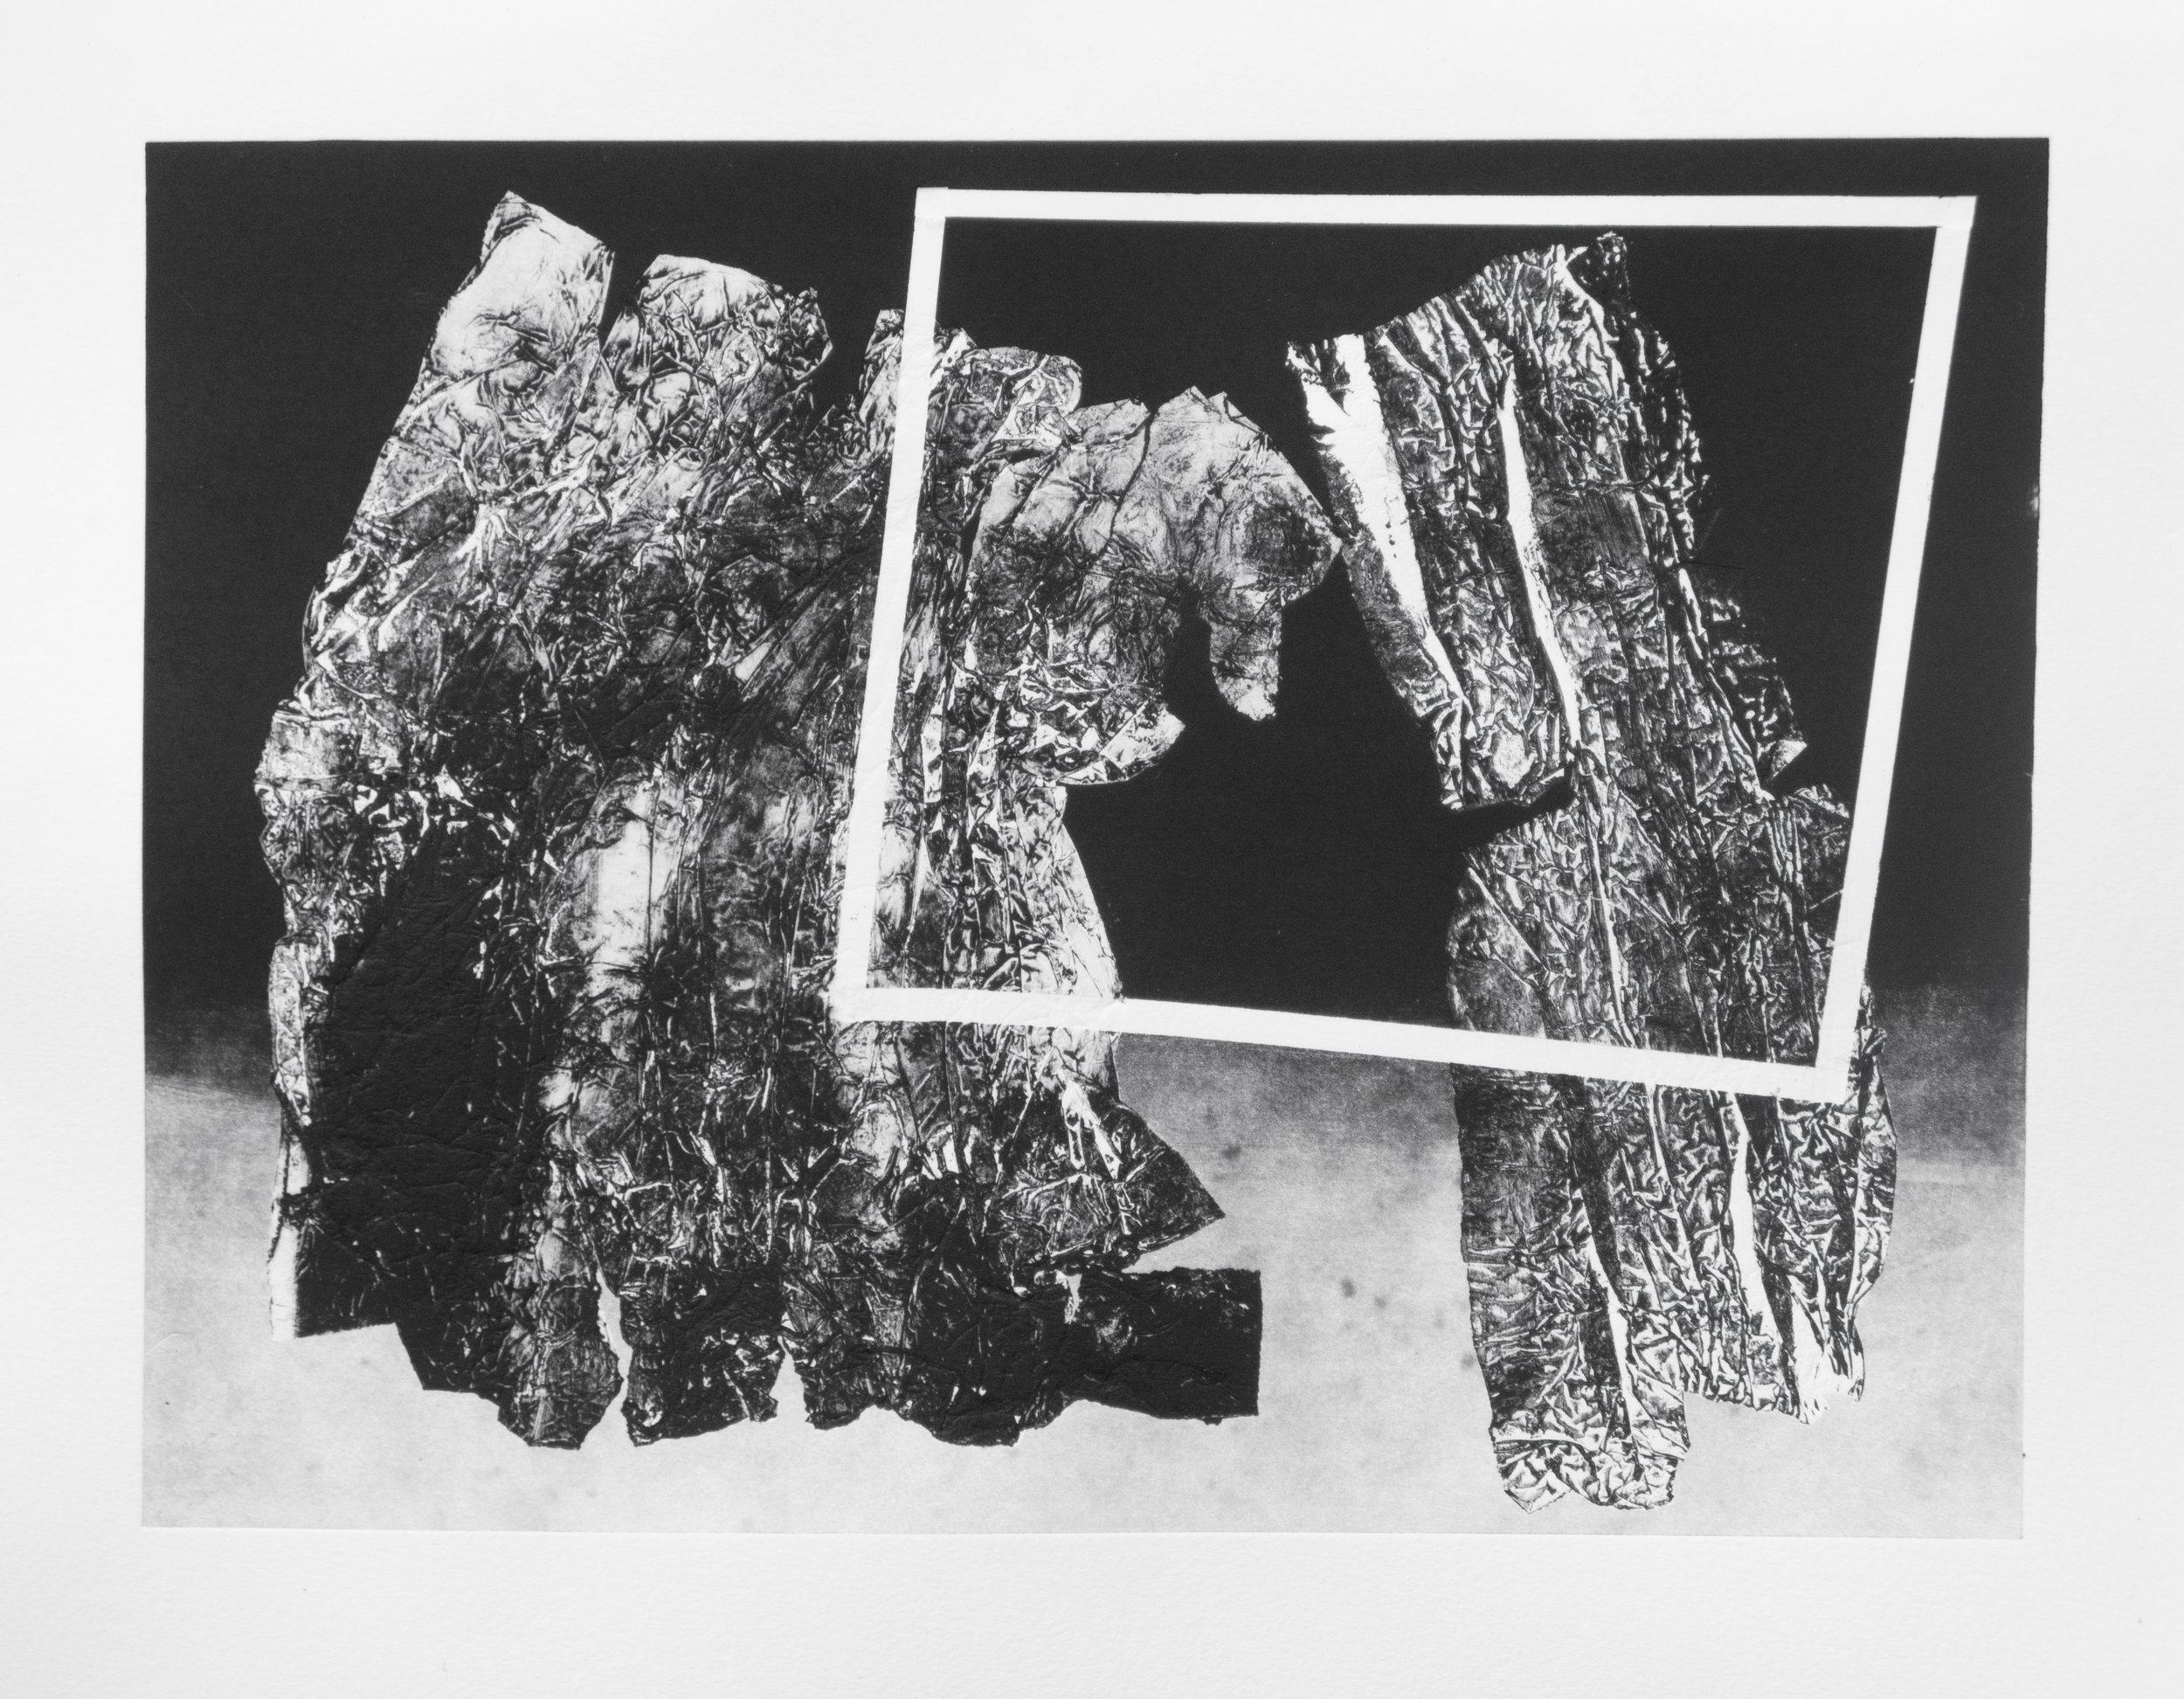 Forms on black 22 (32cm x 26 cm)